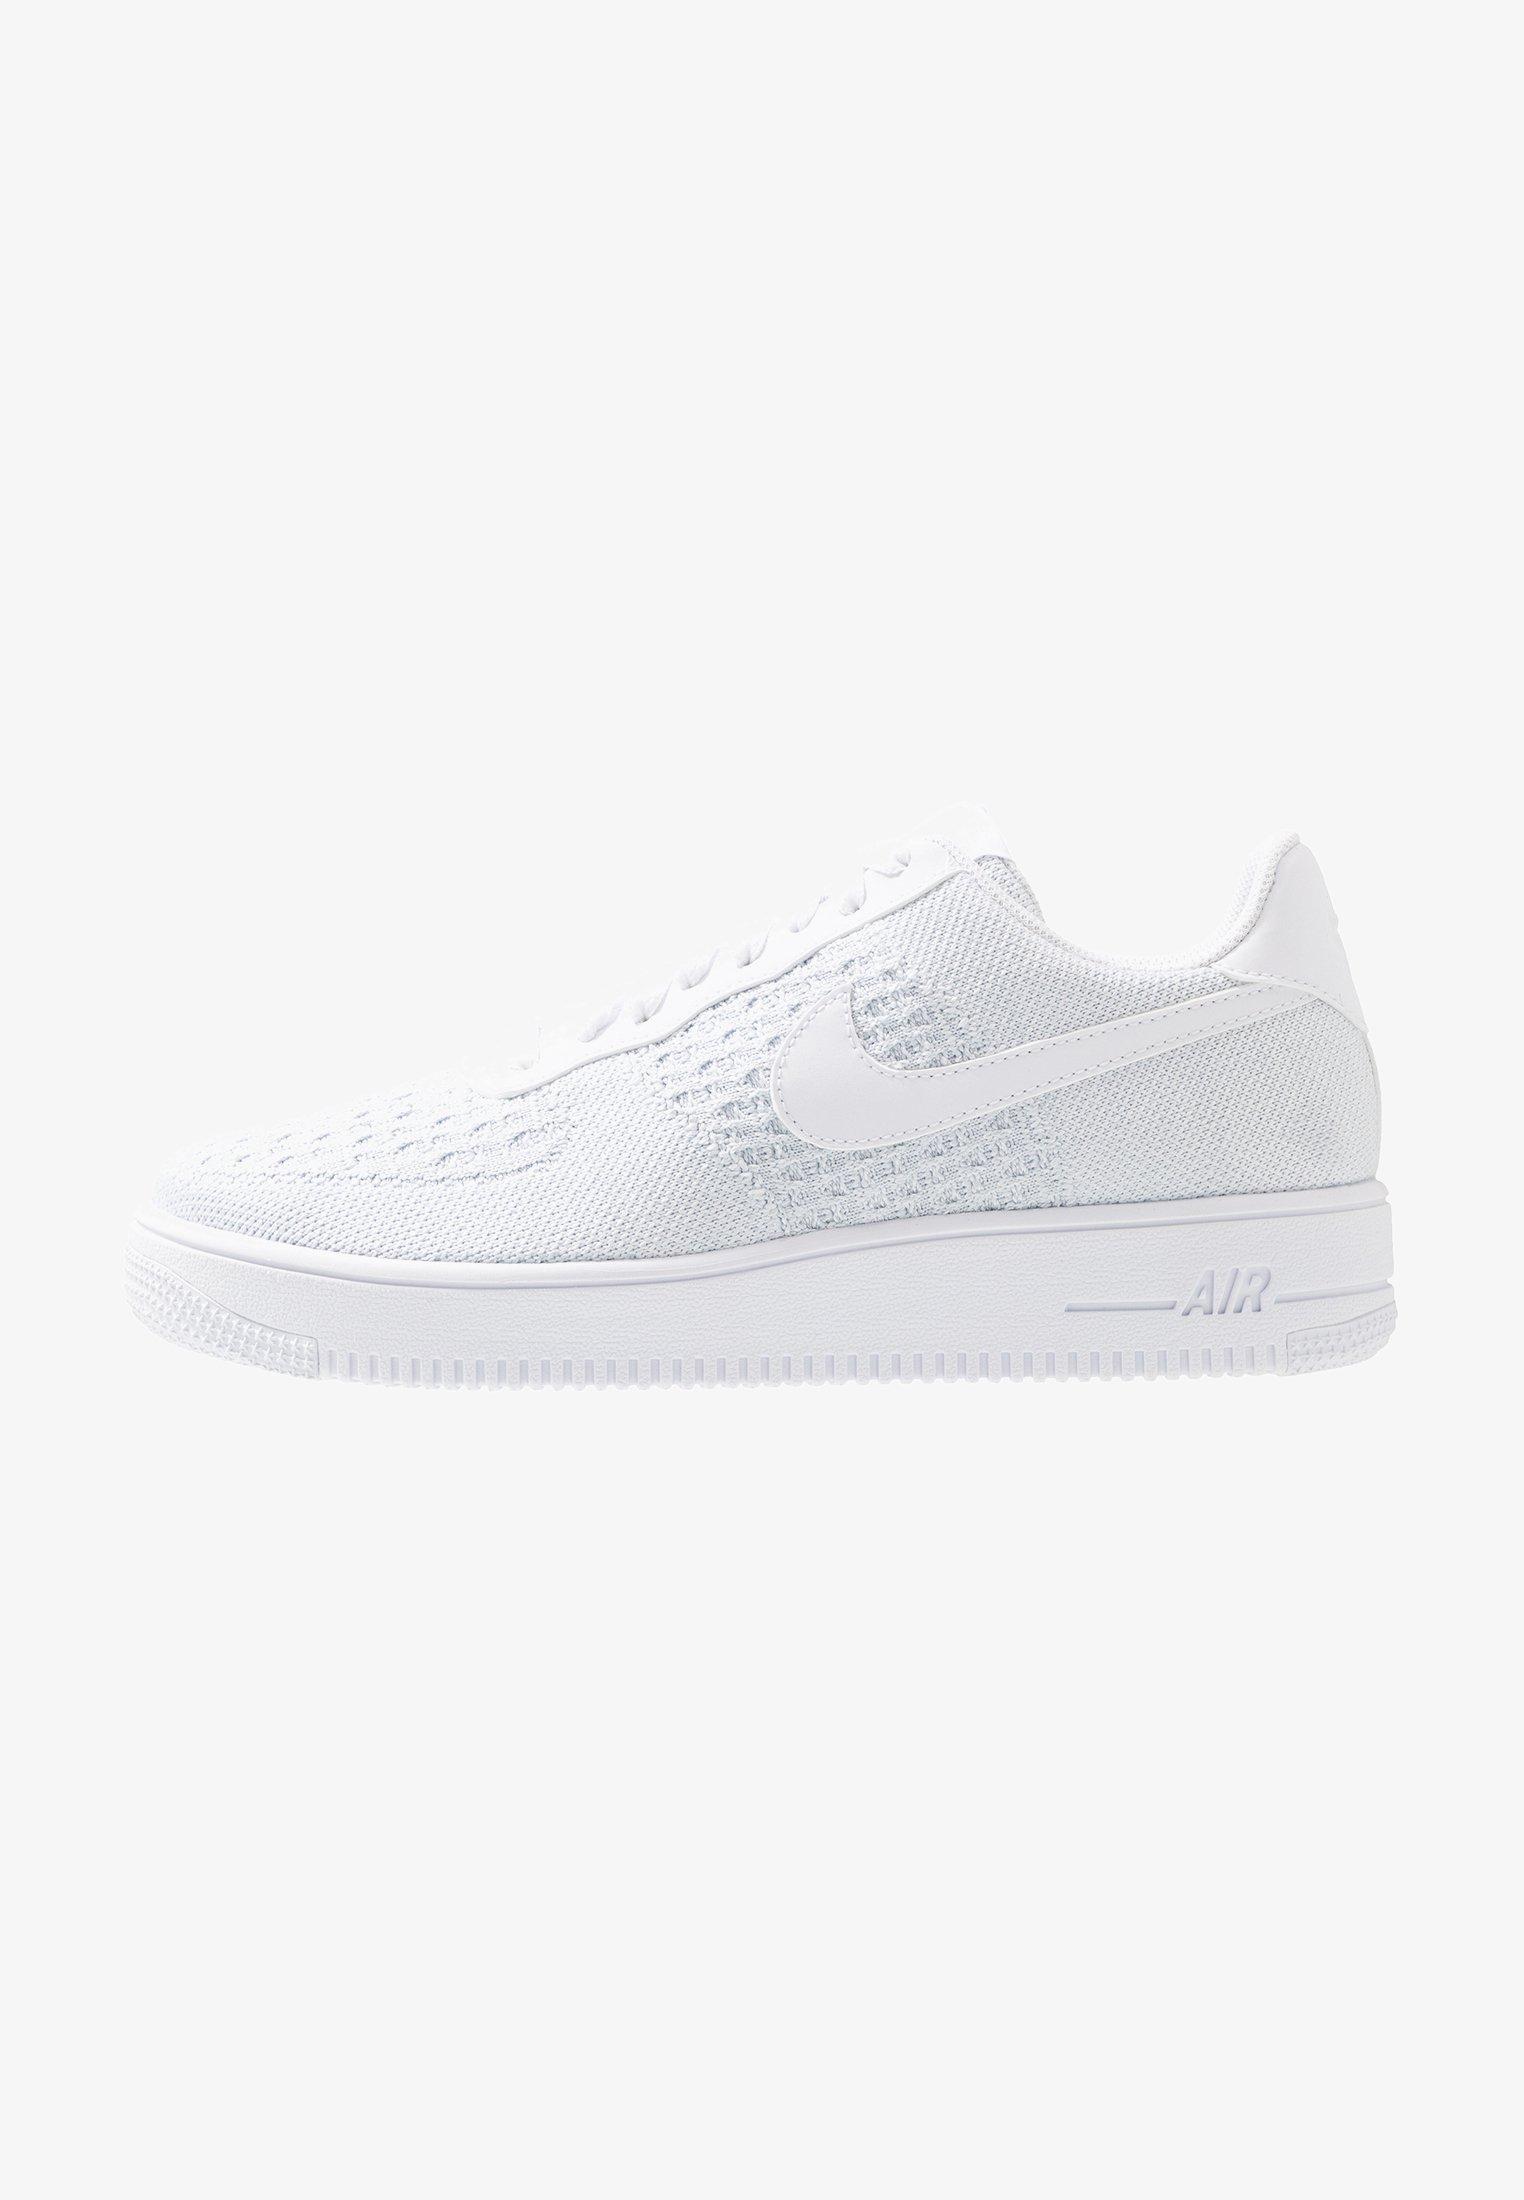 isla Pila de Malgastar  Nike Sportswear AIR FORCE 1 FLYKNIT 2.0 - Trainers - white/pure  platinum/white - Zalando.co.uk